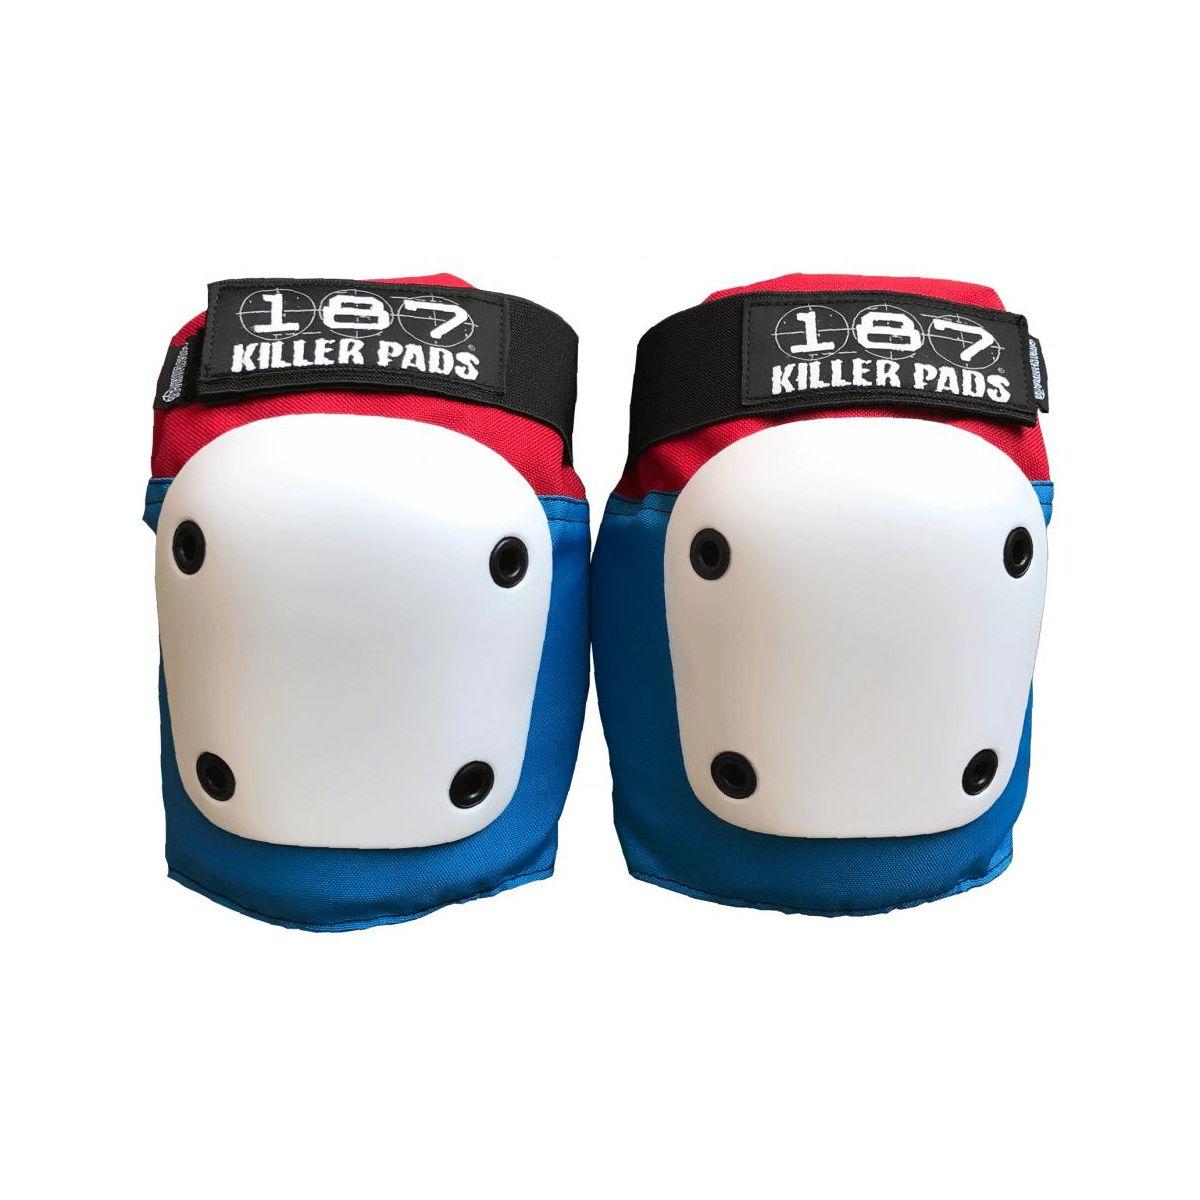 Ochraniacze kolan 187 Killer Pads Fly Red / White / Blue